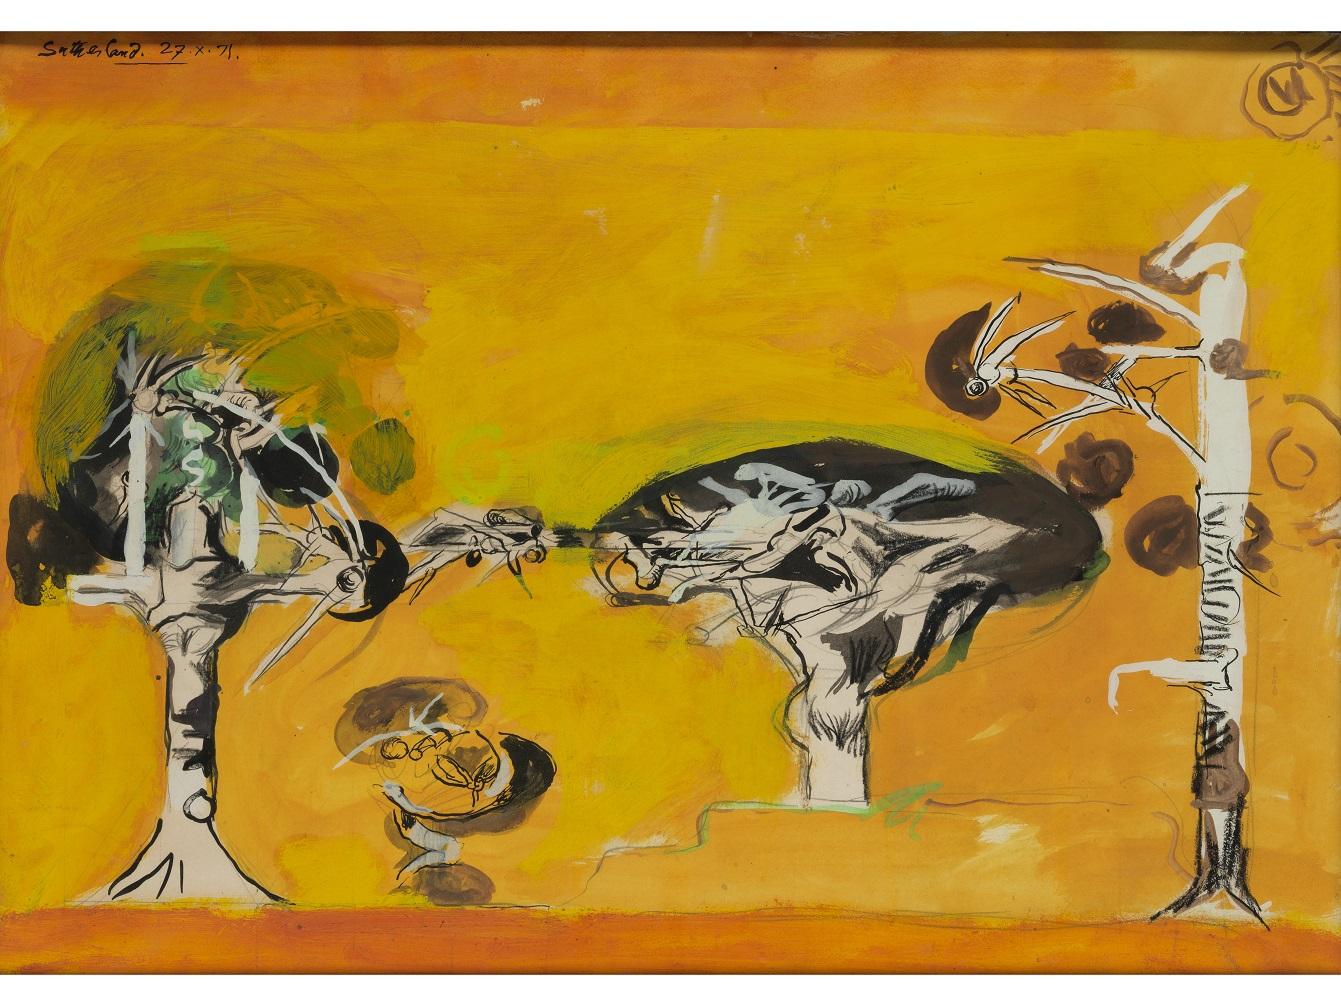 Graham Sutherland, OM (1903-1980), Thorn Trees